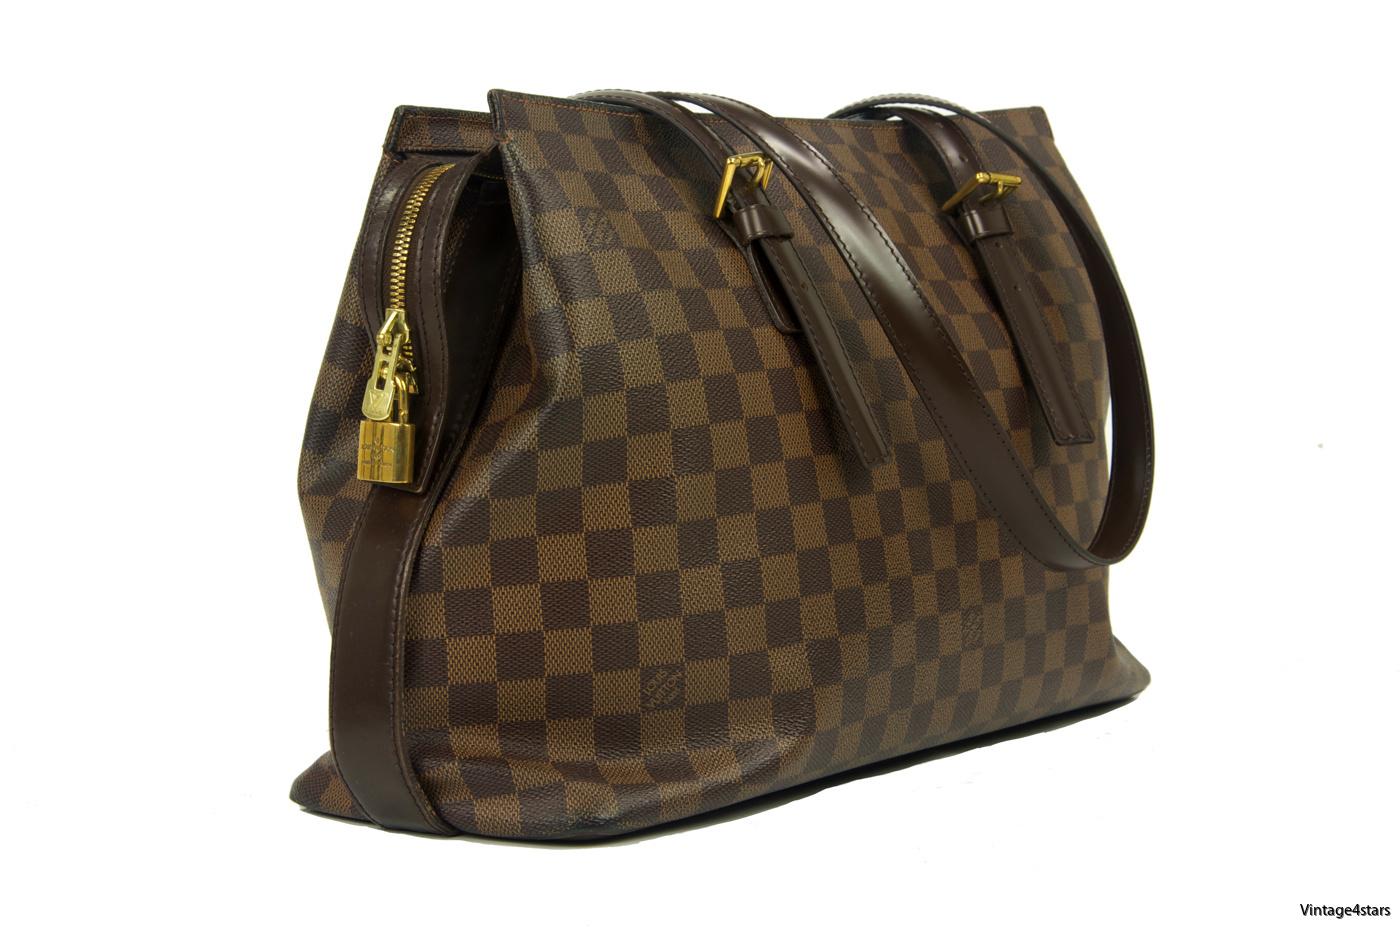 Louis Vuitton Chelsea Damier Ebene 28